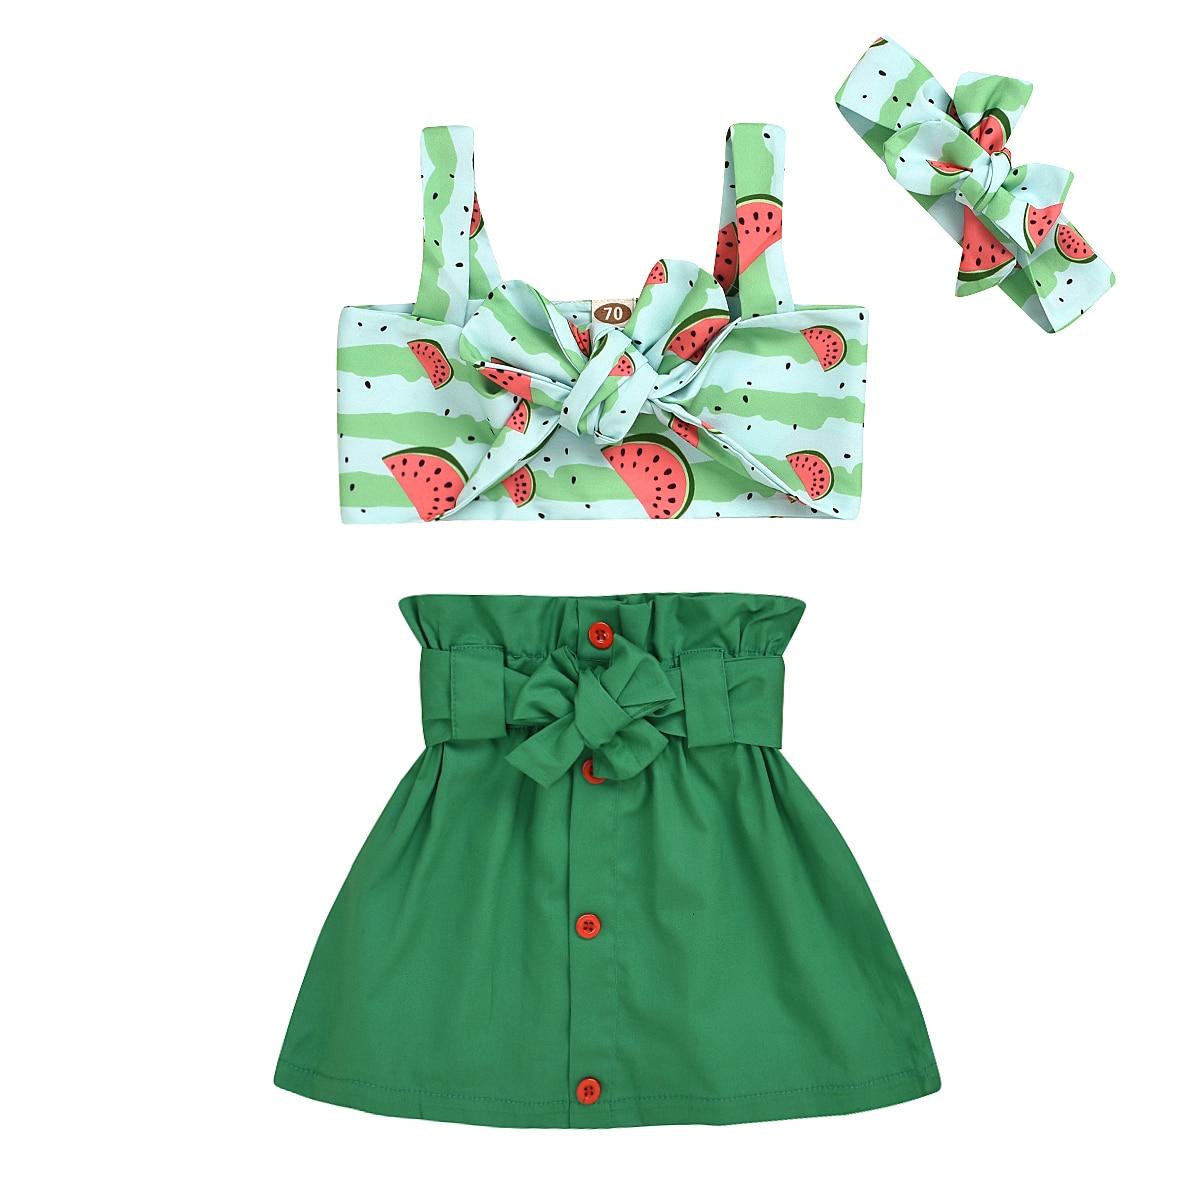 0-24M Newborn  Baby Girls Watermelon Printed Sling Crop Tops + Bowknot Solid Skirt + Headwear Clothes Set